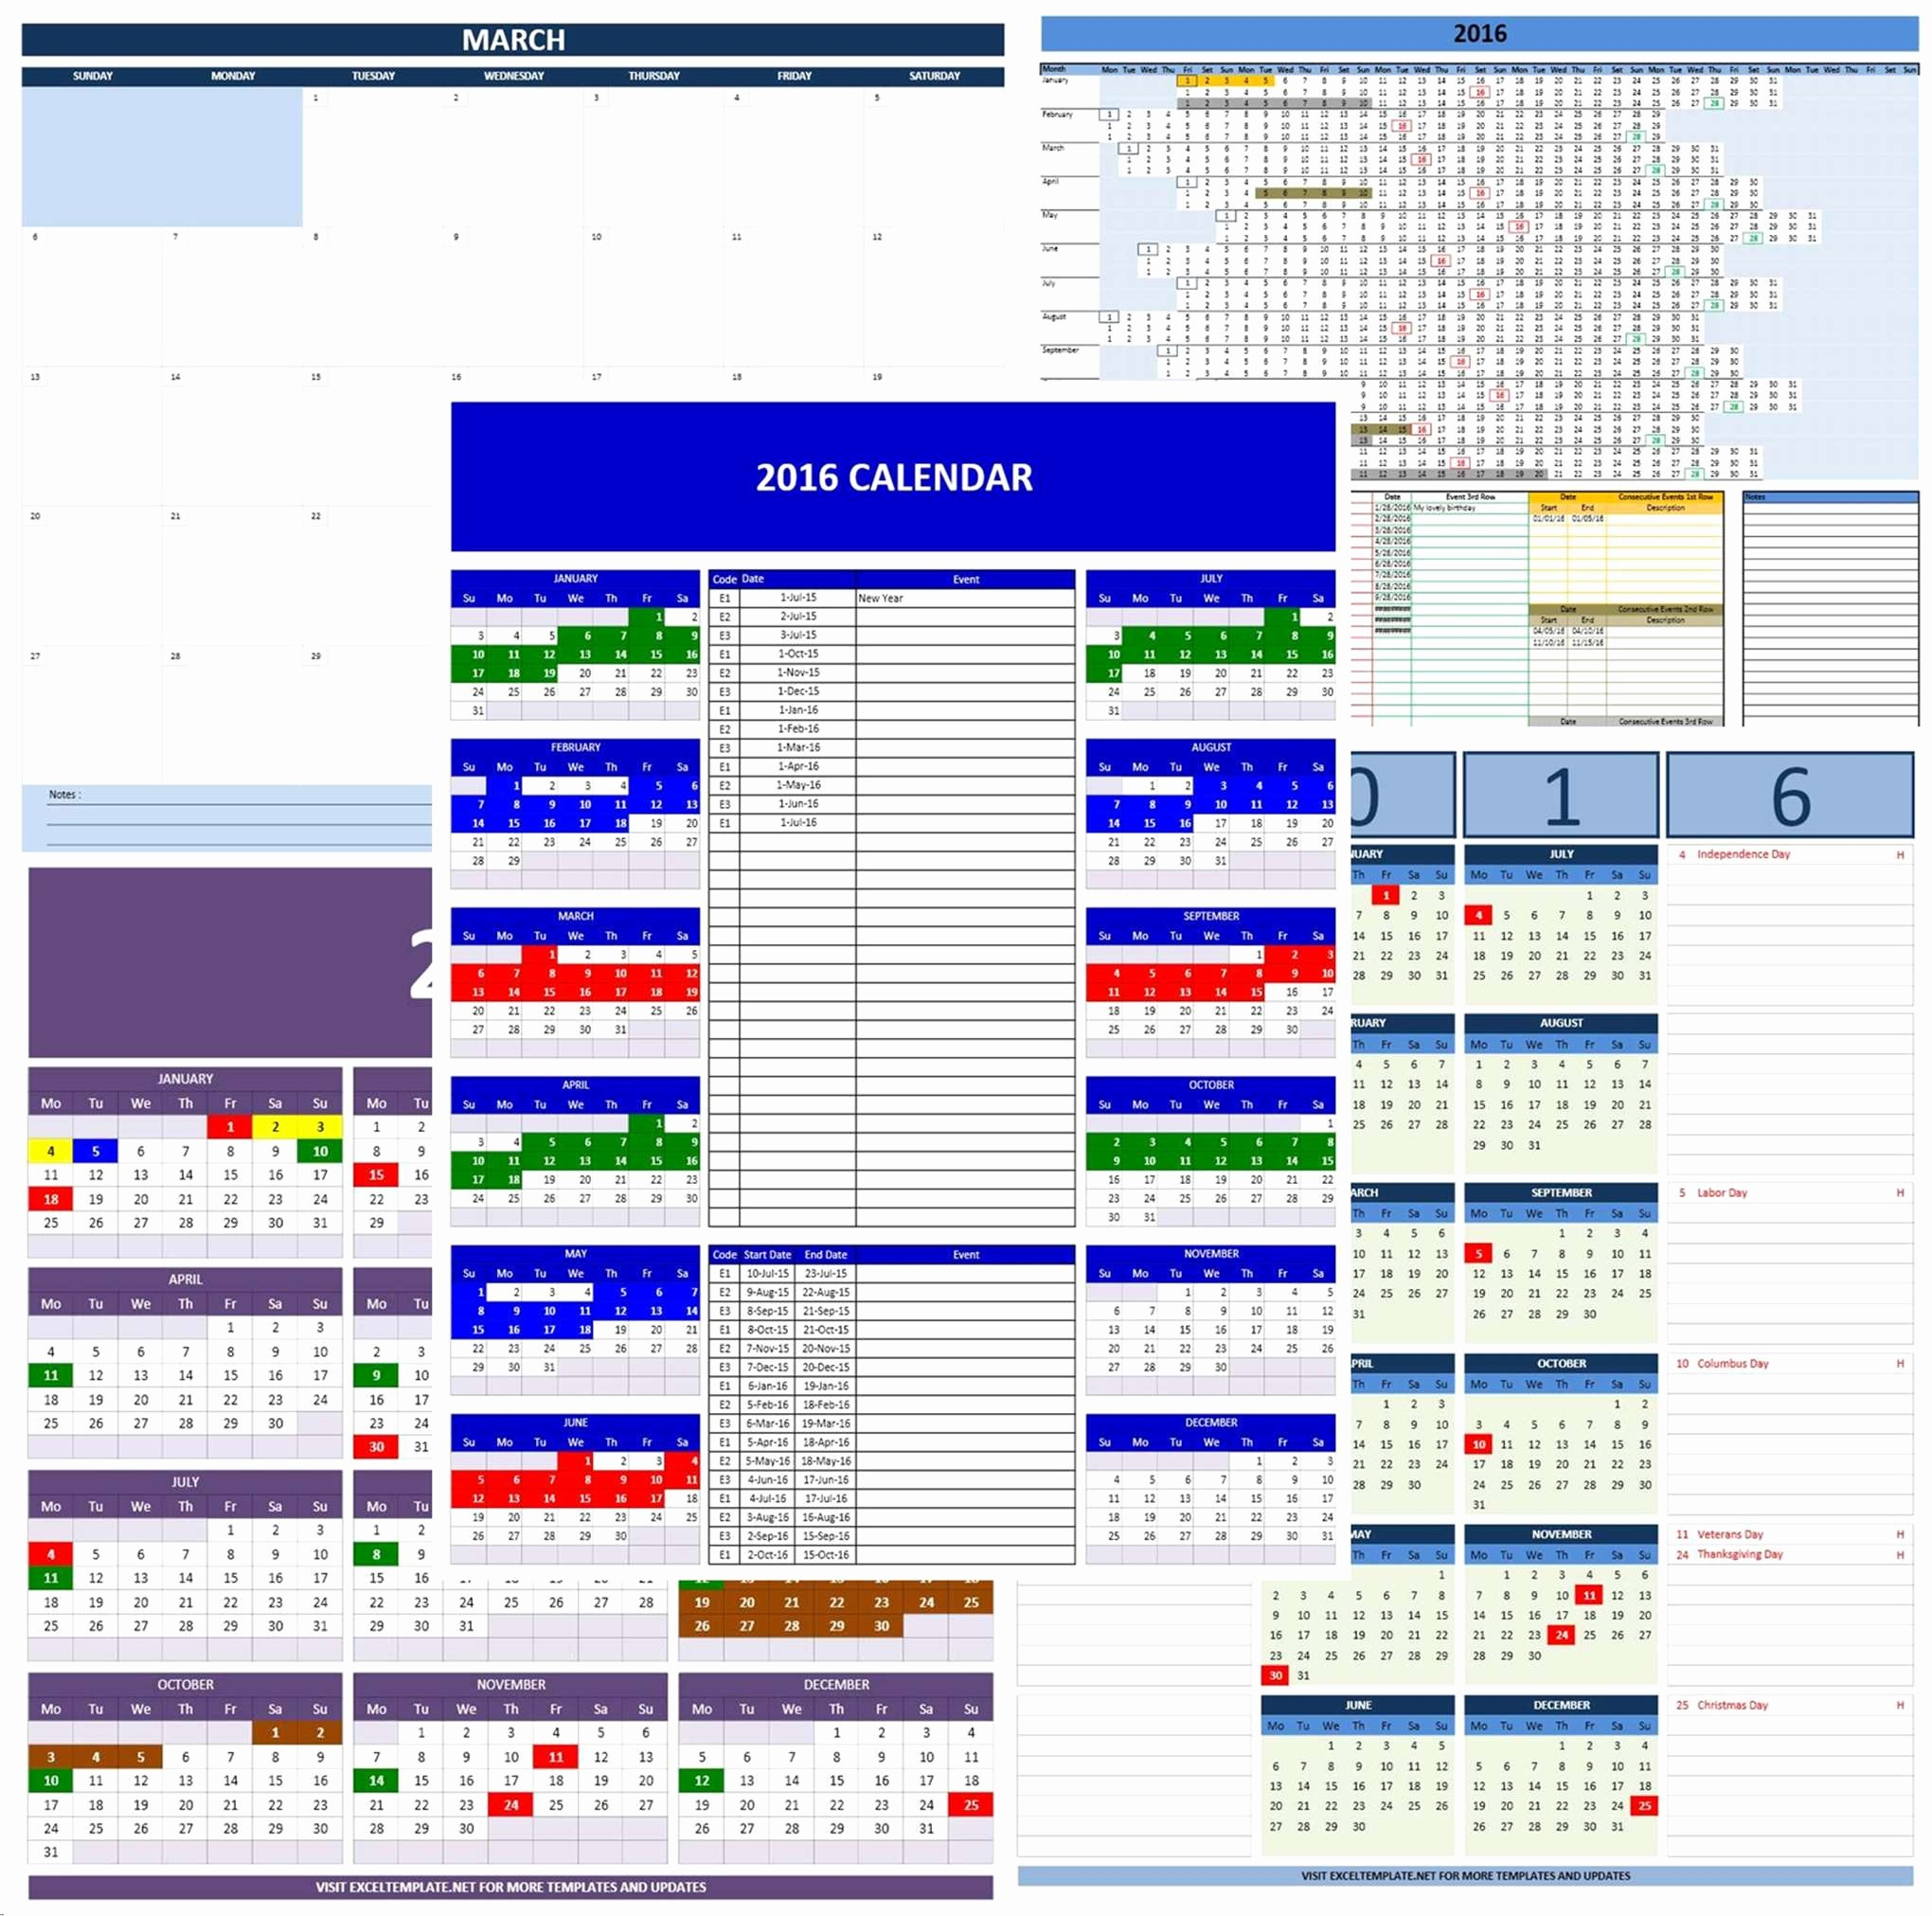 2016 Calendar Excel with Holidays Beautiful 2016 Calendars